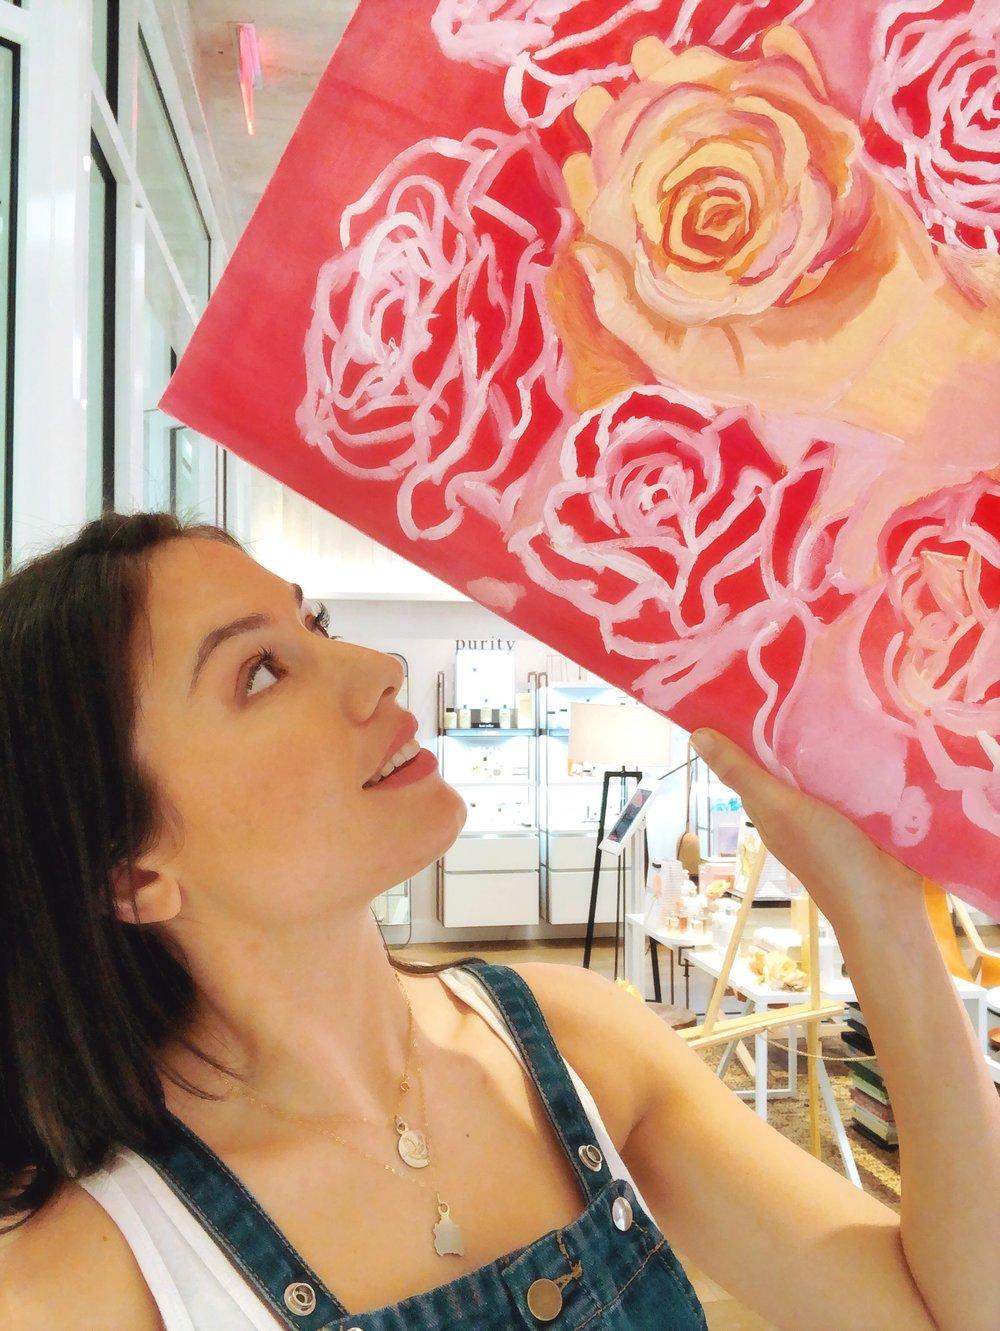 katrina-eugenia-philosophy-skincare-love-philosophy-amazing-grace-amazing-grace-ballet-rose-live-painting-oil-painting04.JPG